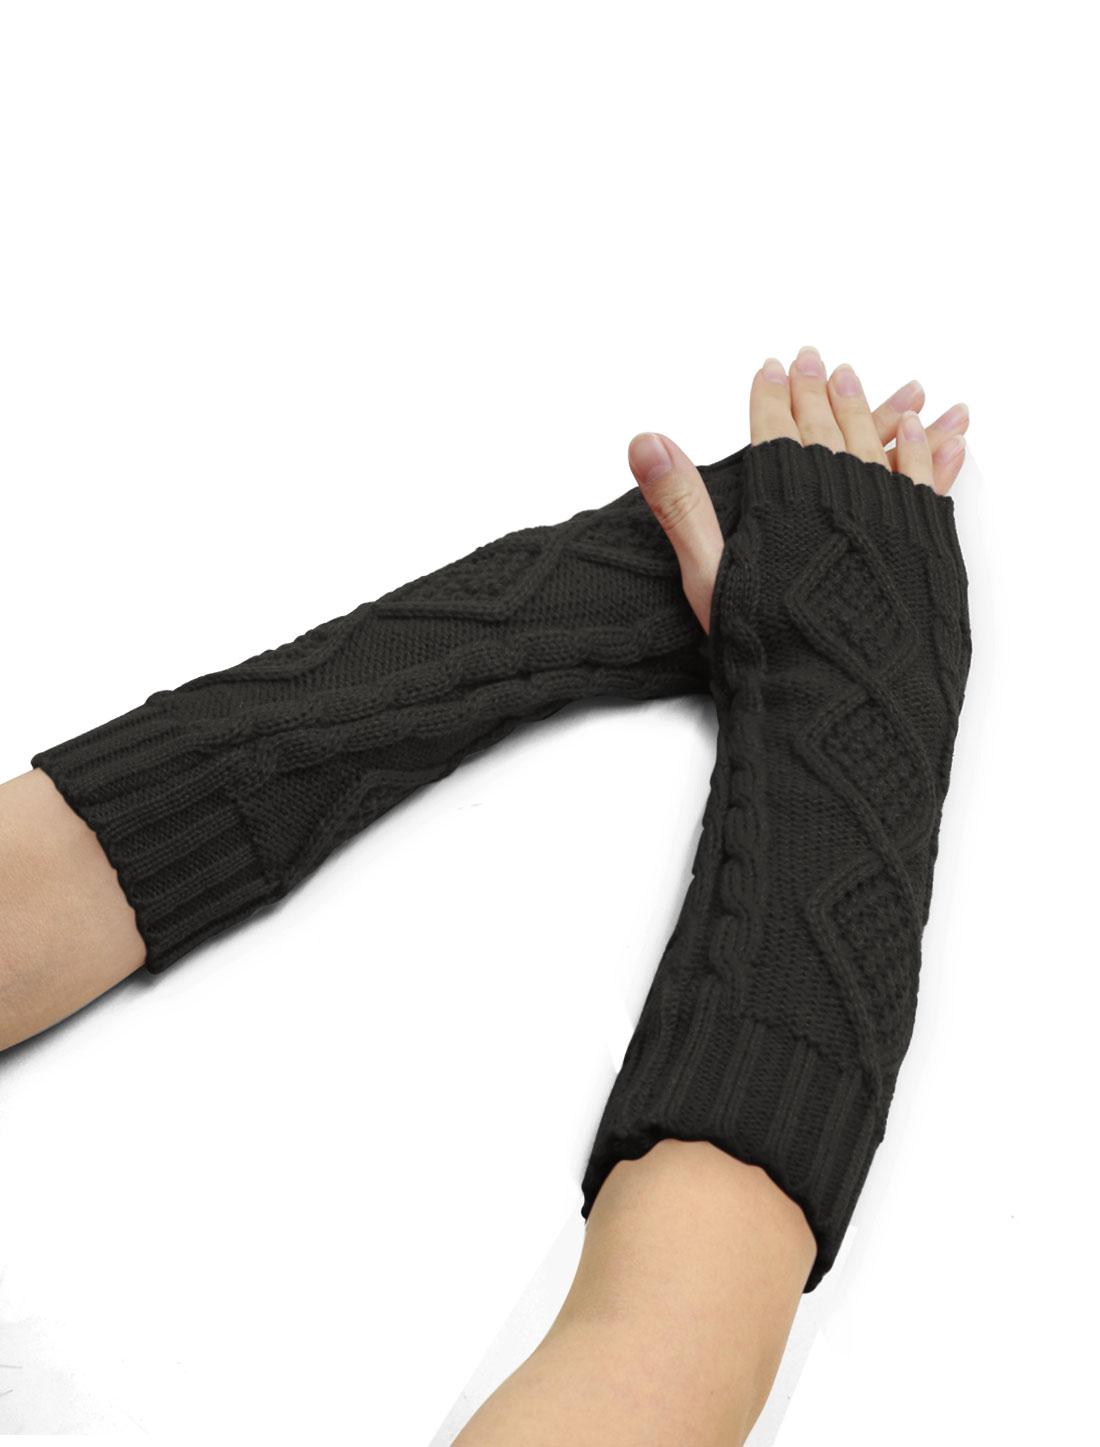 Women Elbow Length Argyle Design Cable Knit Arm Warmers Pair Dark Gray